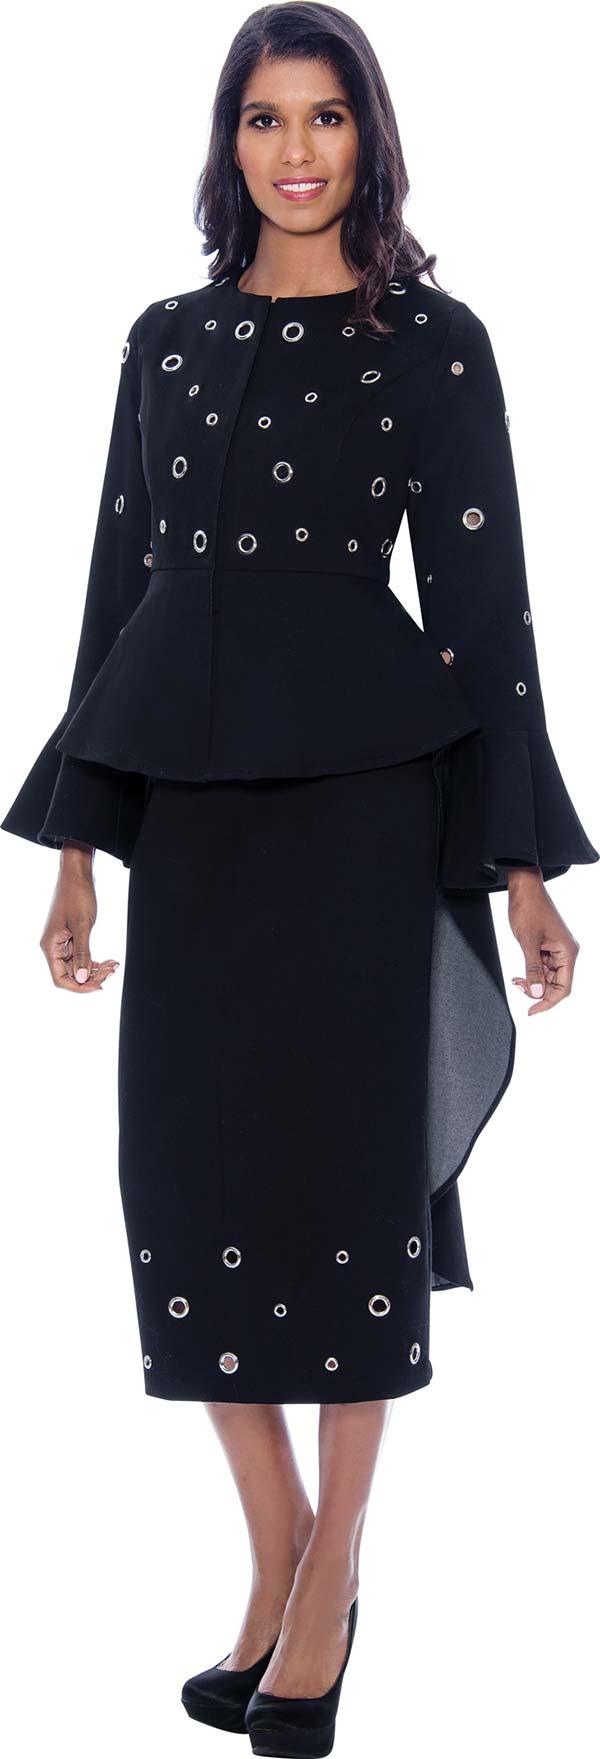 Devine Sport DS62753-Black - Soft Denim Skirt Suit With High-Low Style Jacket Featuring Grommet Details